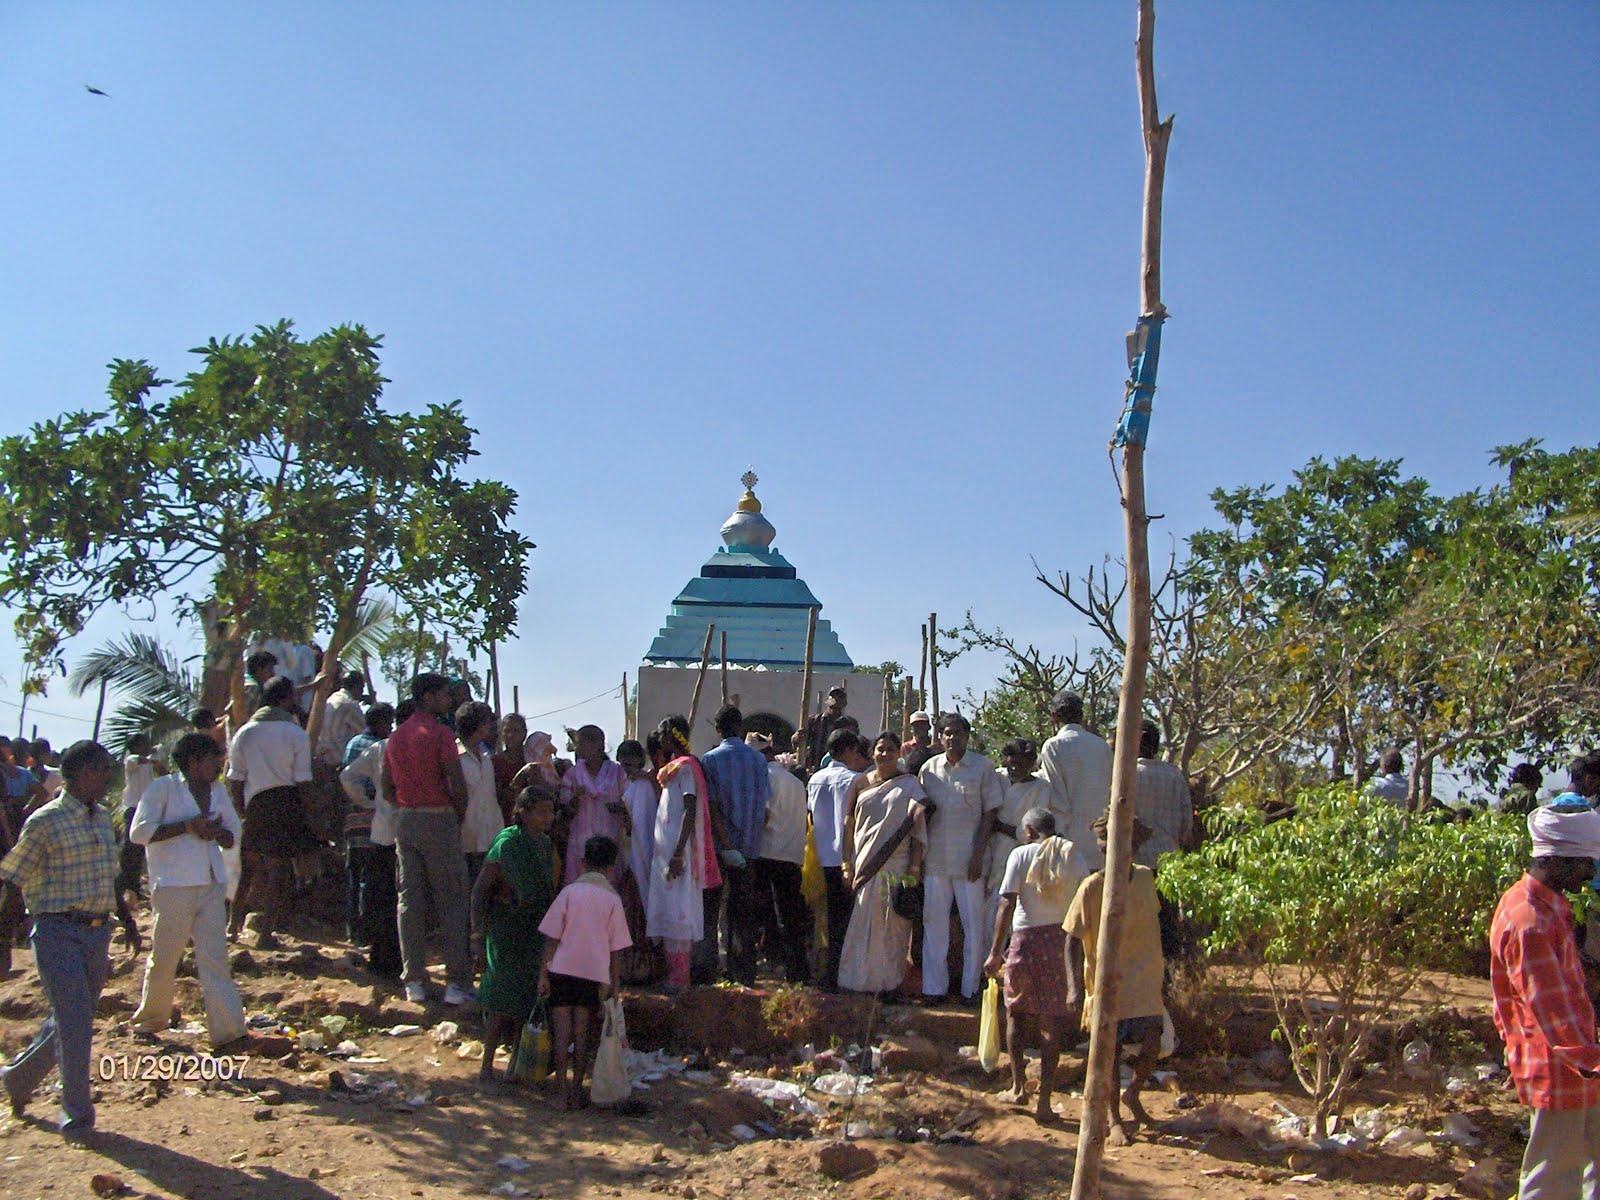 http://2.bp.blogspot.com/_oIowsJflyGQ/SsDp4_io68I/AAAAAAAAAXE/aT56cKhqng8/s1600/Dr+%26+Rupa+at+Venugopal+swamy+temple+long-view+on+salihundam+hills.JPG